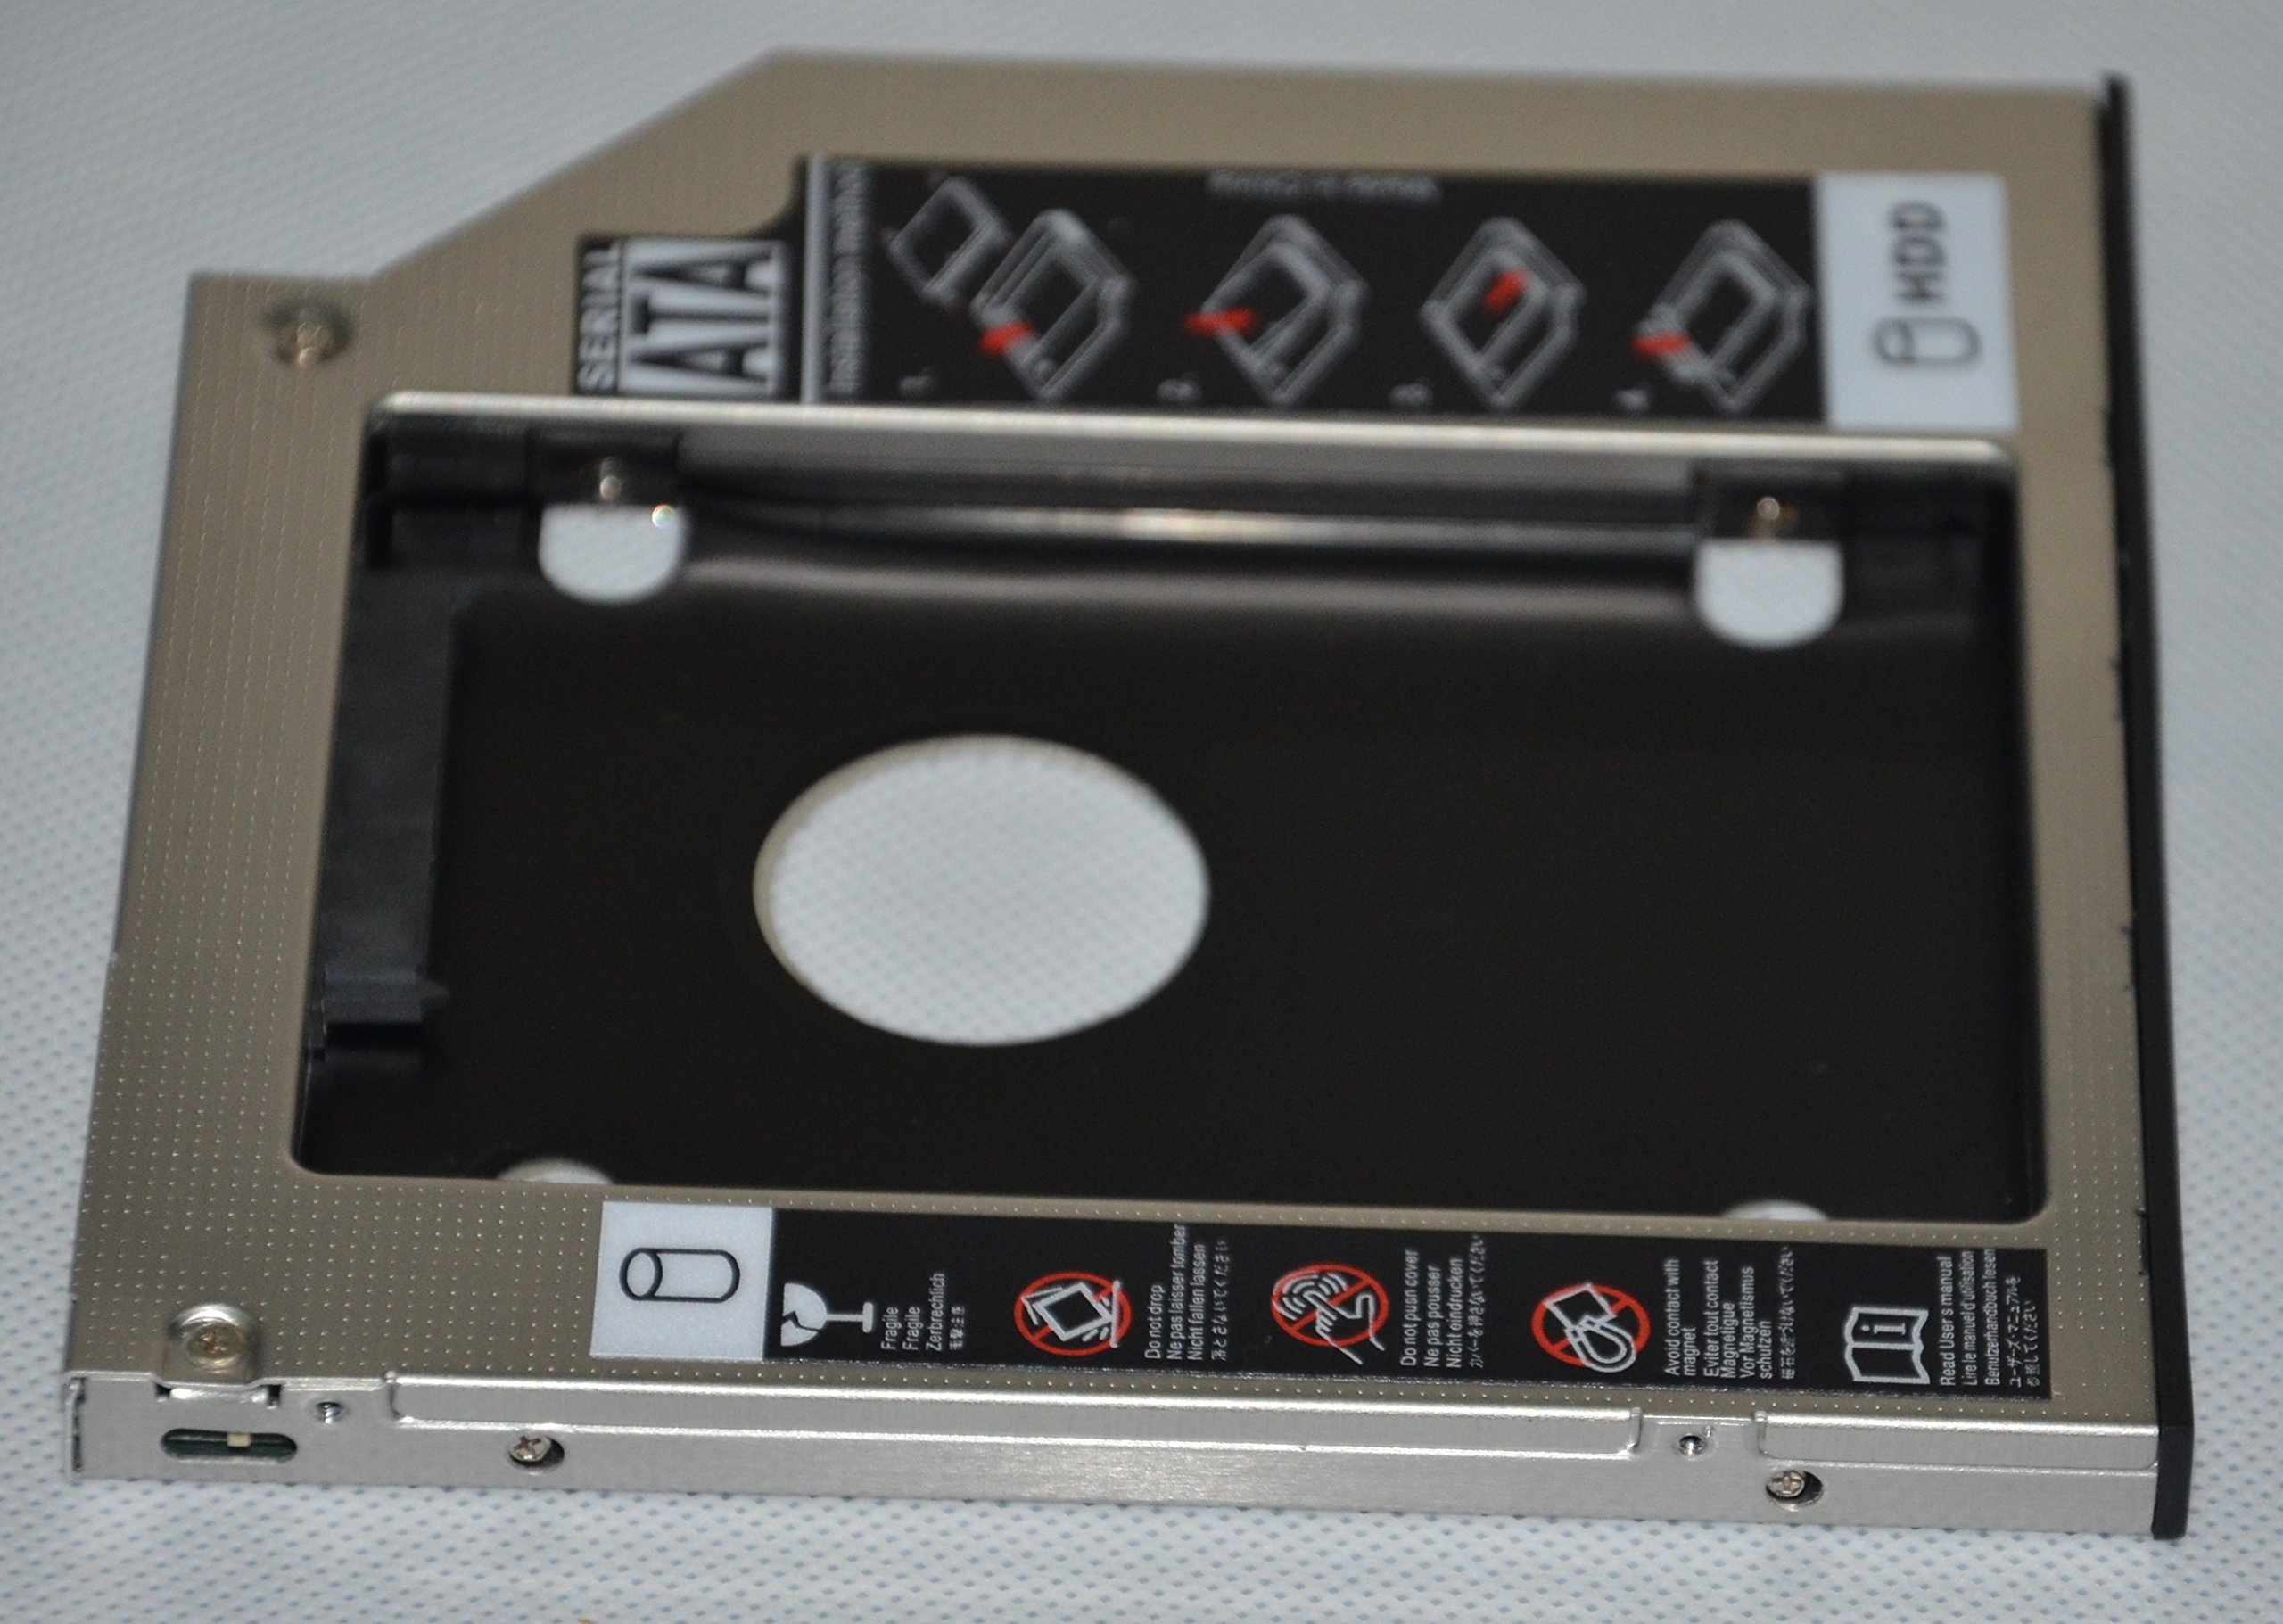 Deyoung 2nd HDD SSD Caddy Adapter for Dell Latitude E6420 E6520 E6320 E6430 E6530 E6330 by De Young (Image #4)